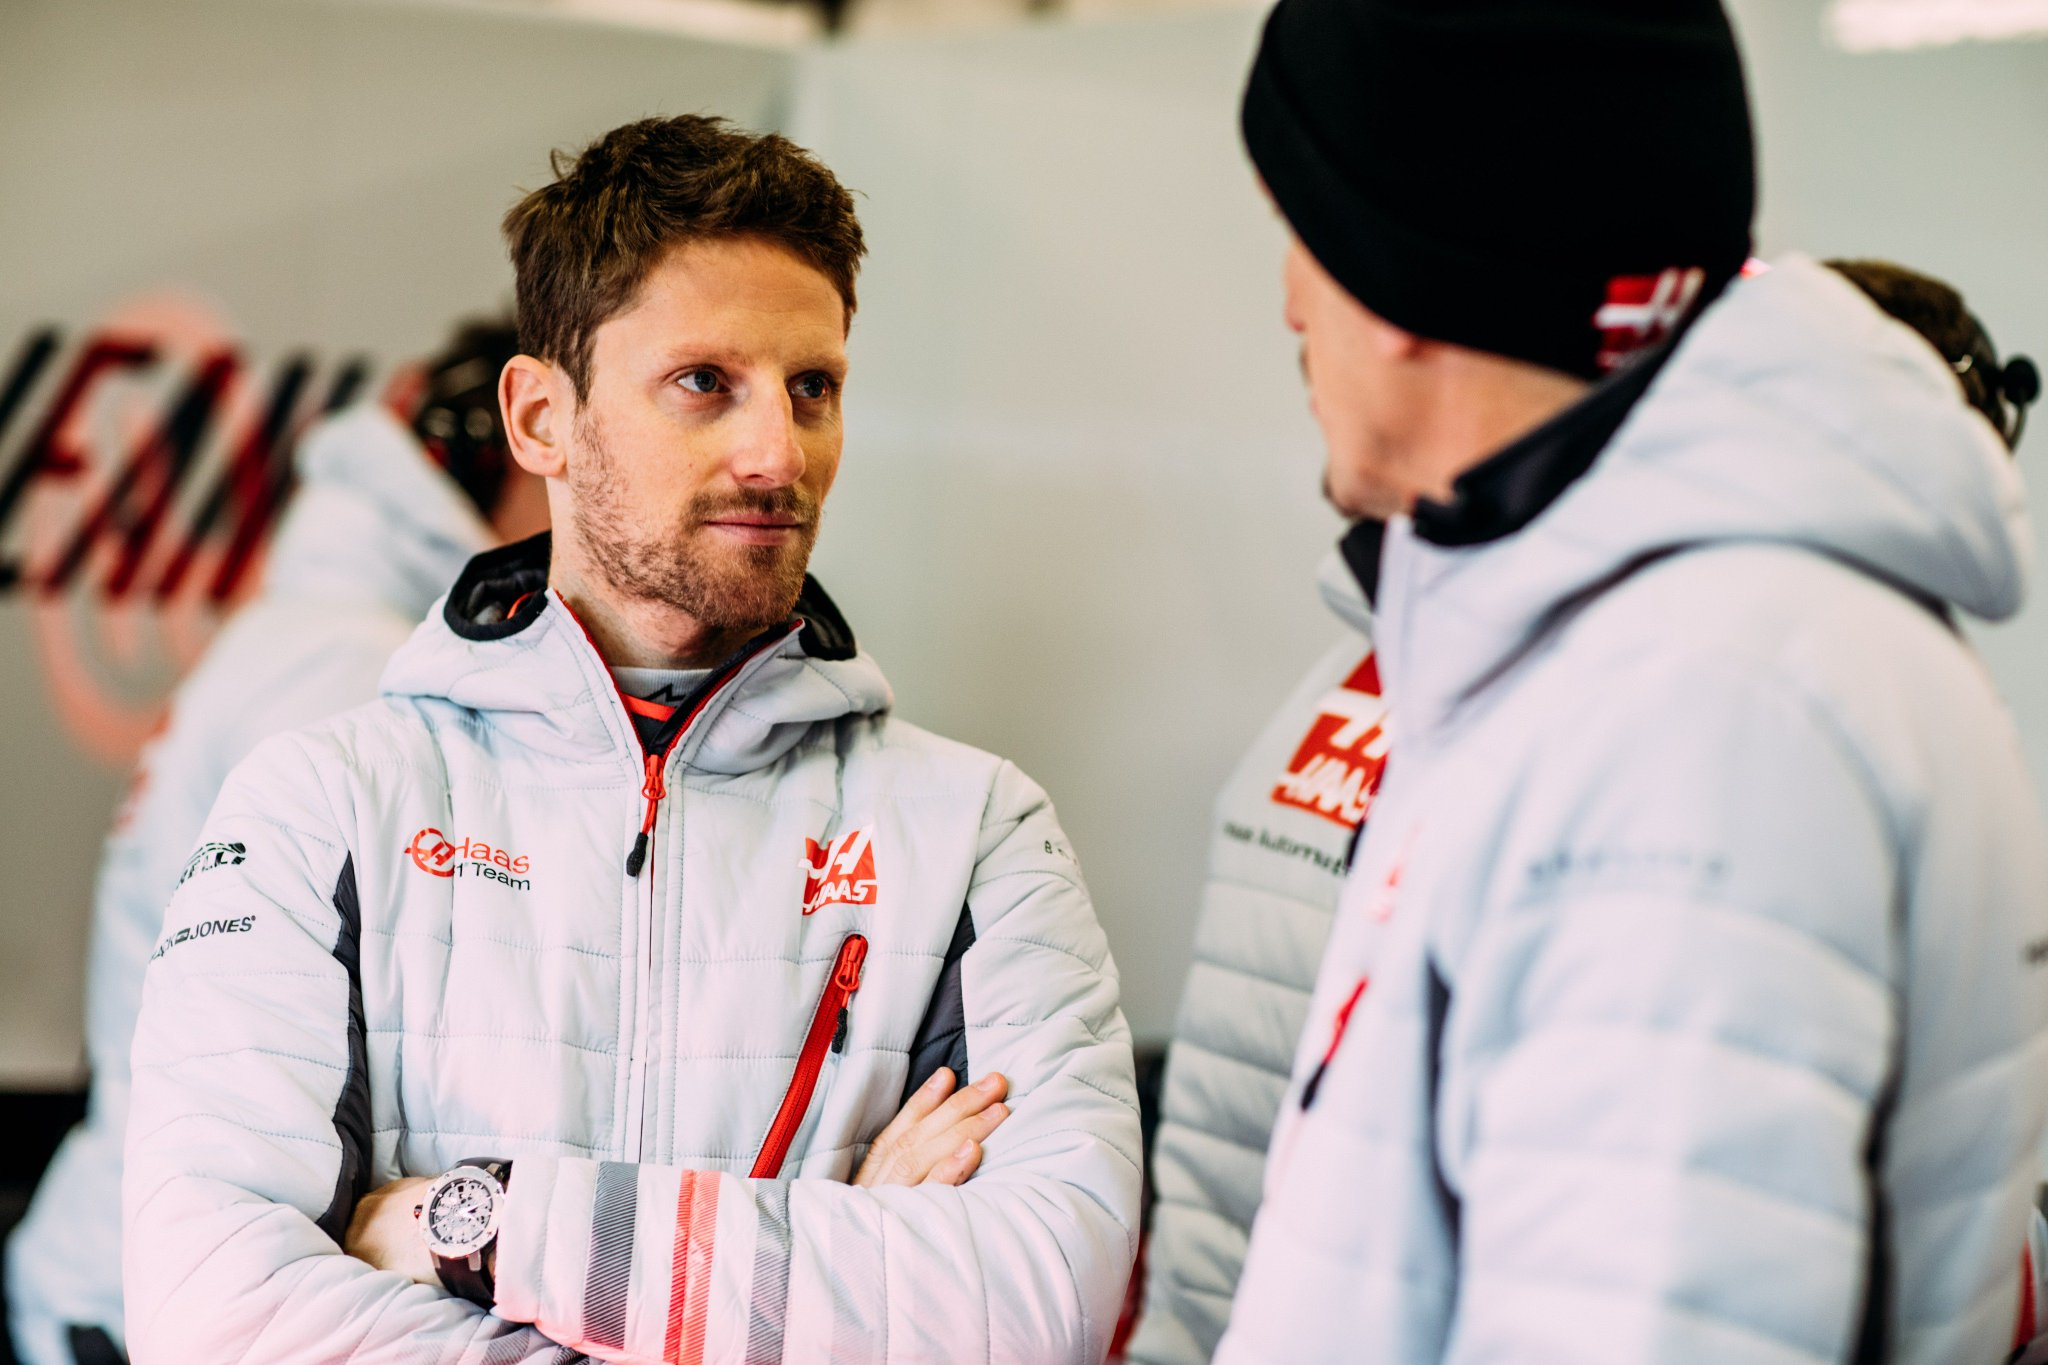 Happy birthday Romain Grosjean